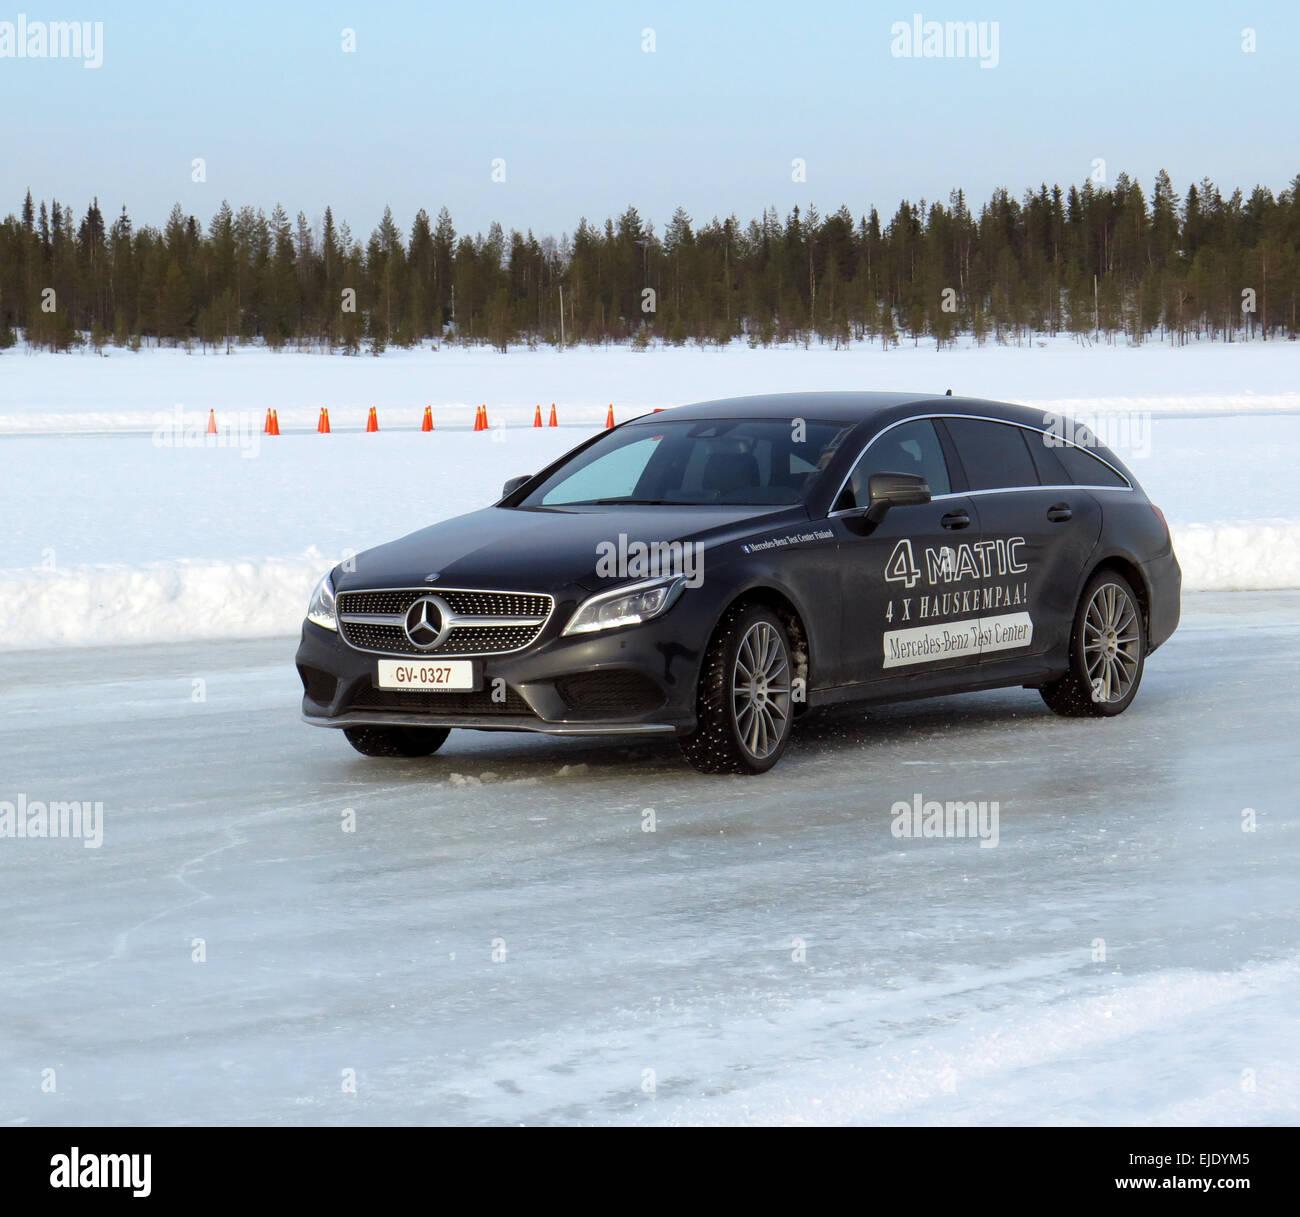 2013 Mercedes Benz C250 Luxury Usa Car Expo: Mercedes Benz Amg Stock Photos & Mercedes Benz Amg Stock